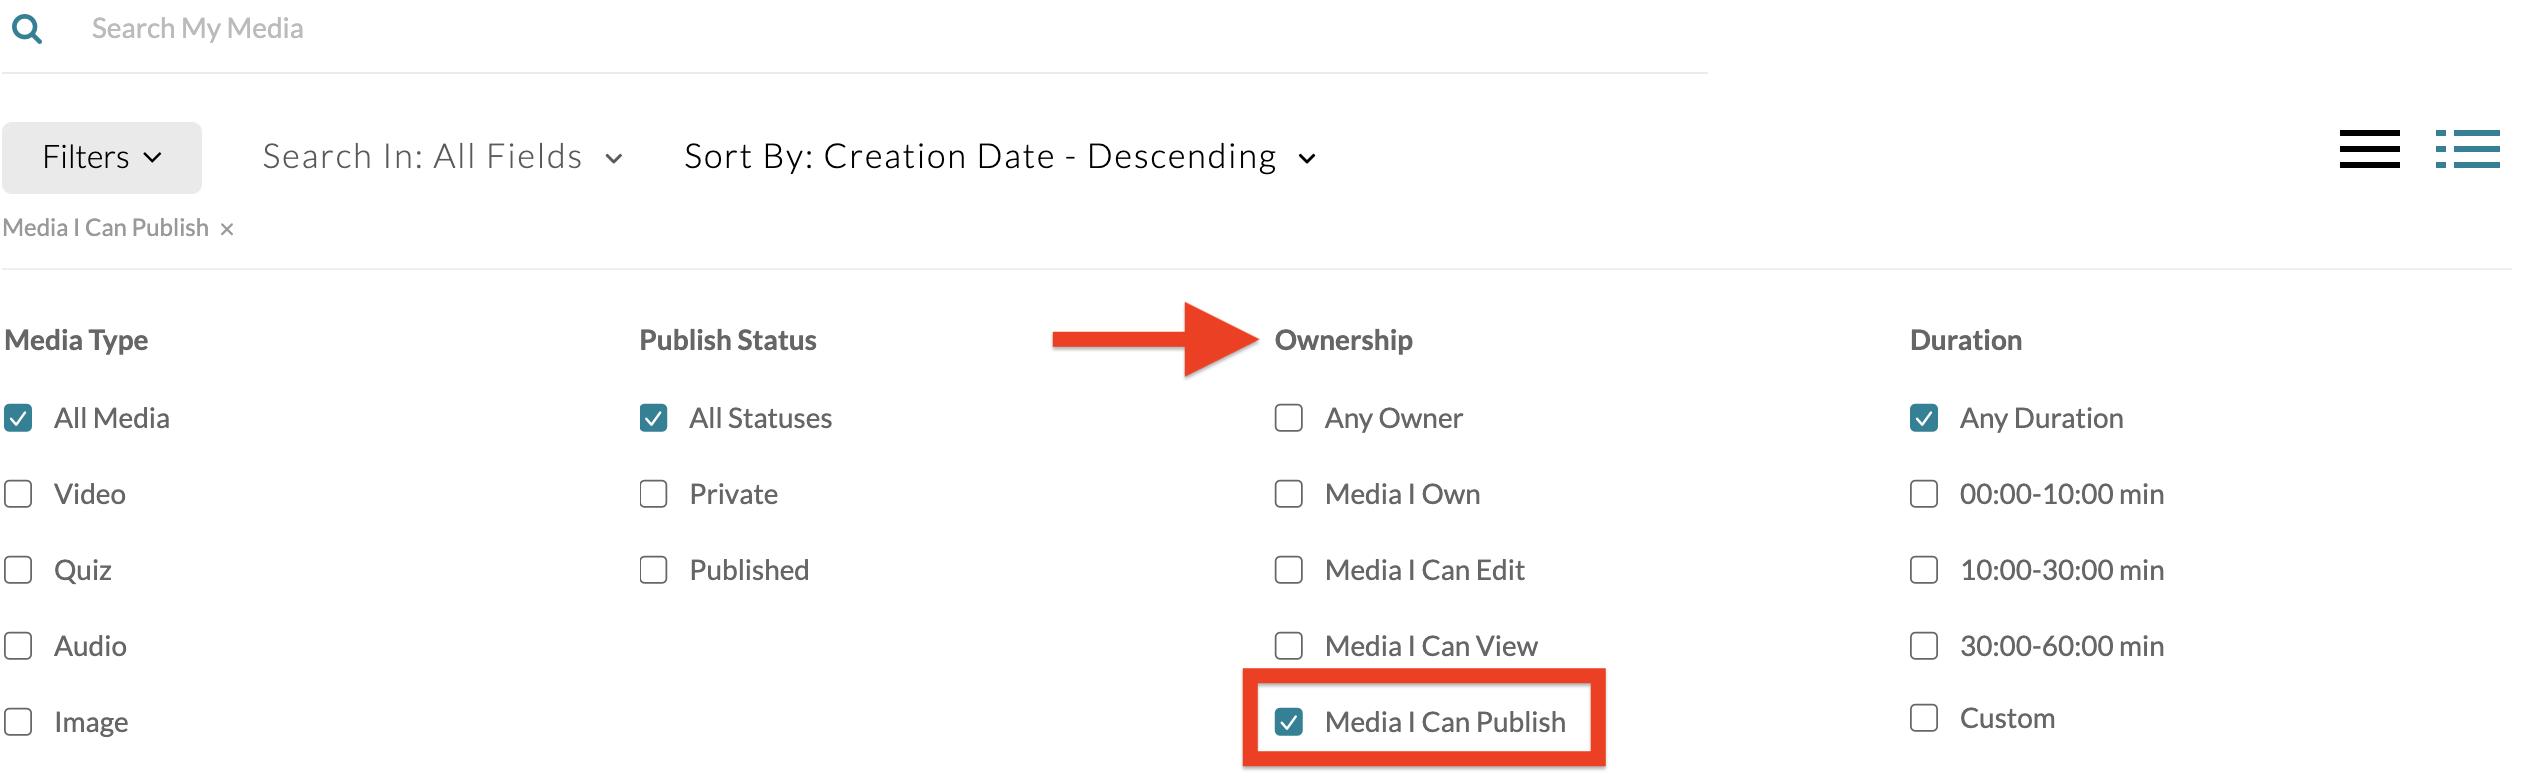 screenshot of media i can publish checkbox